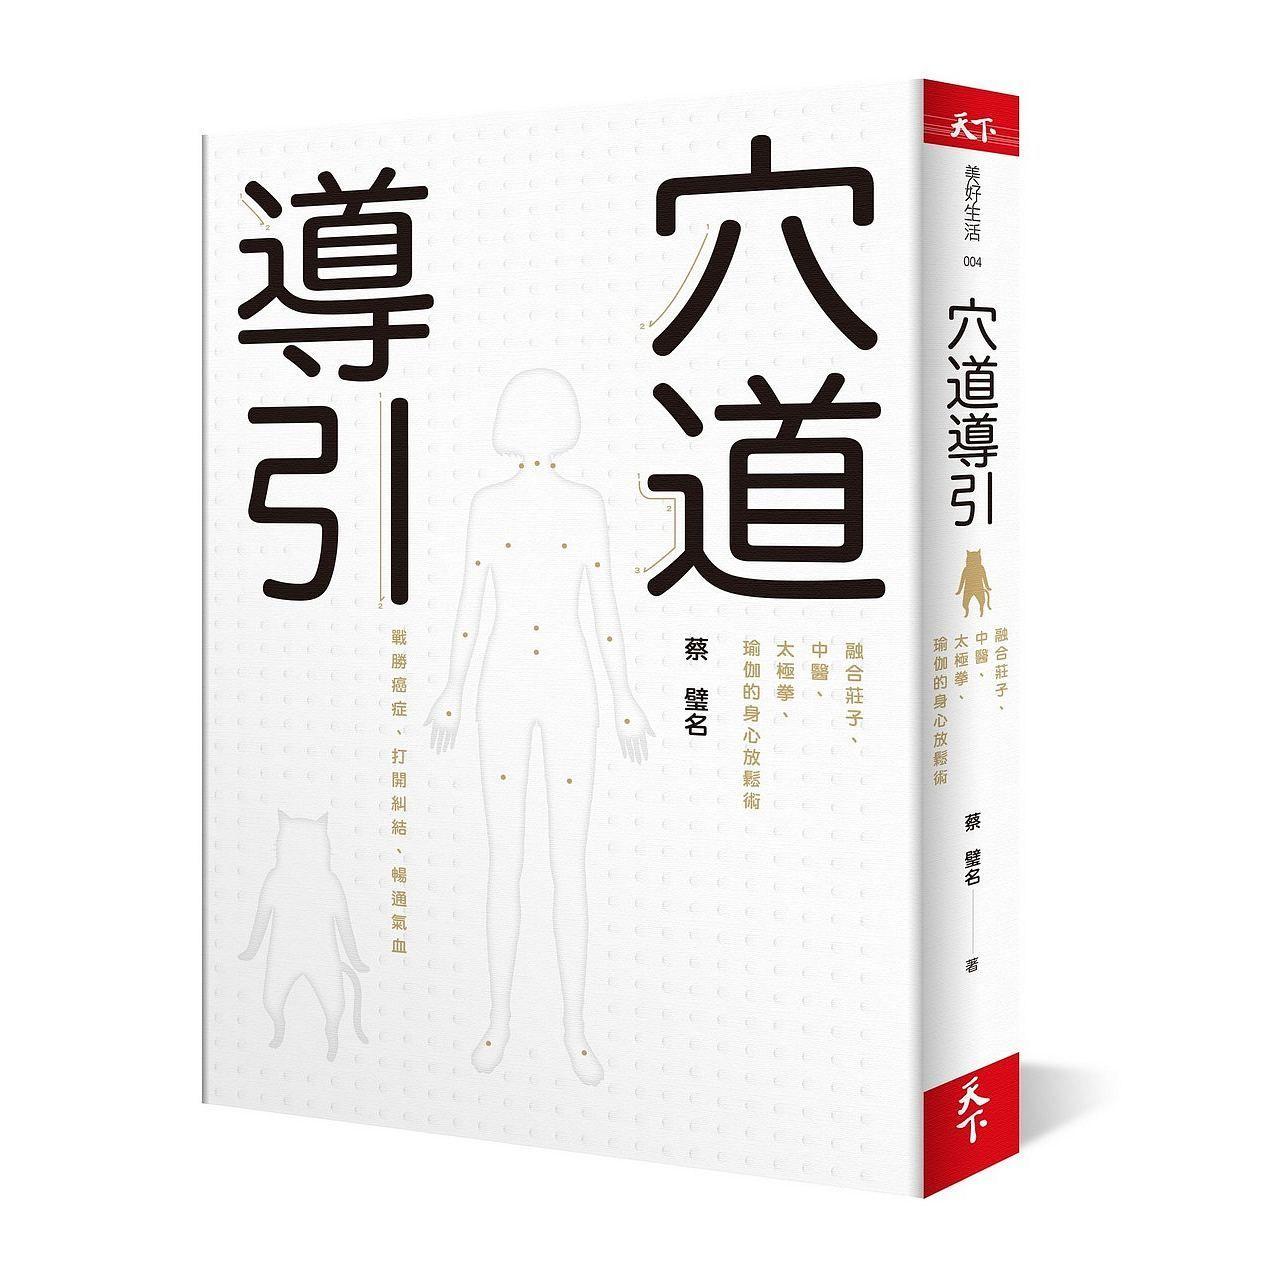 Photo of NTU Cai Anming Point Anleitung: Integration von Zhuangzi, tr…